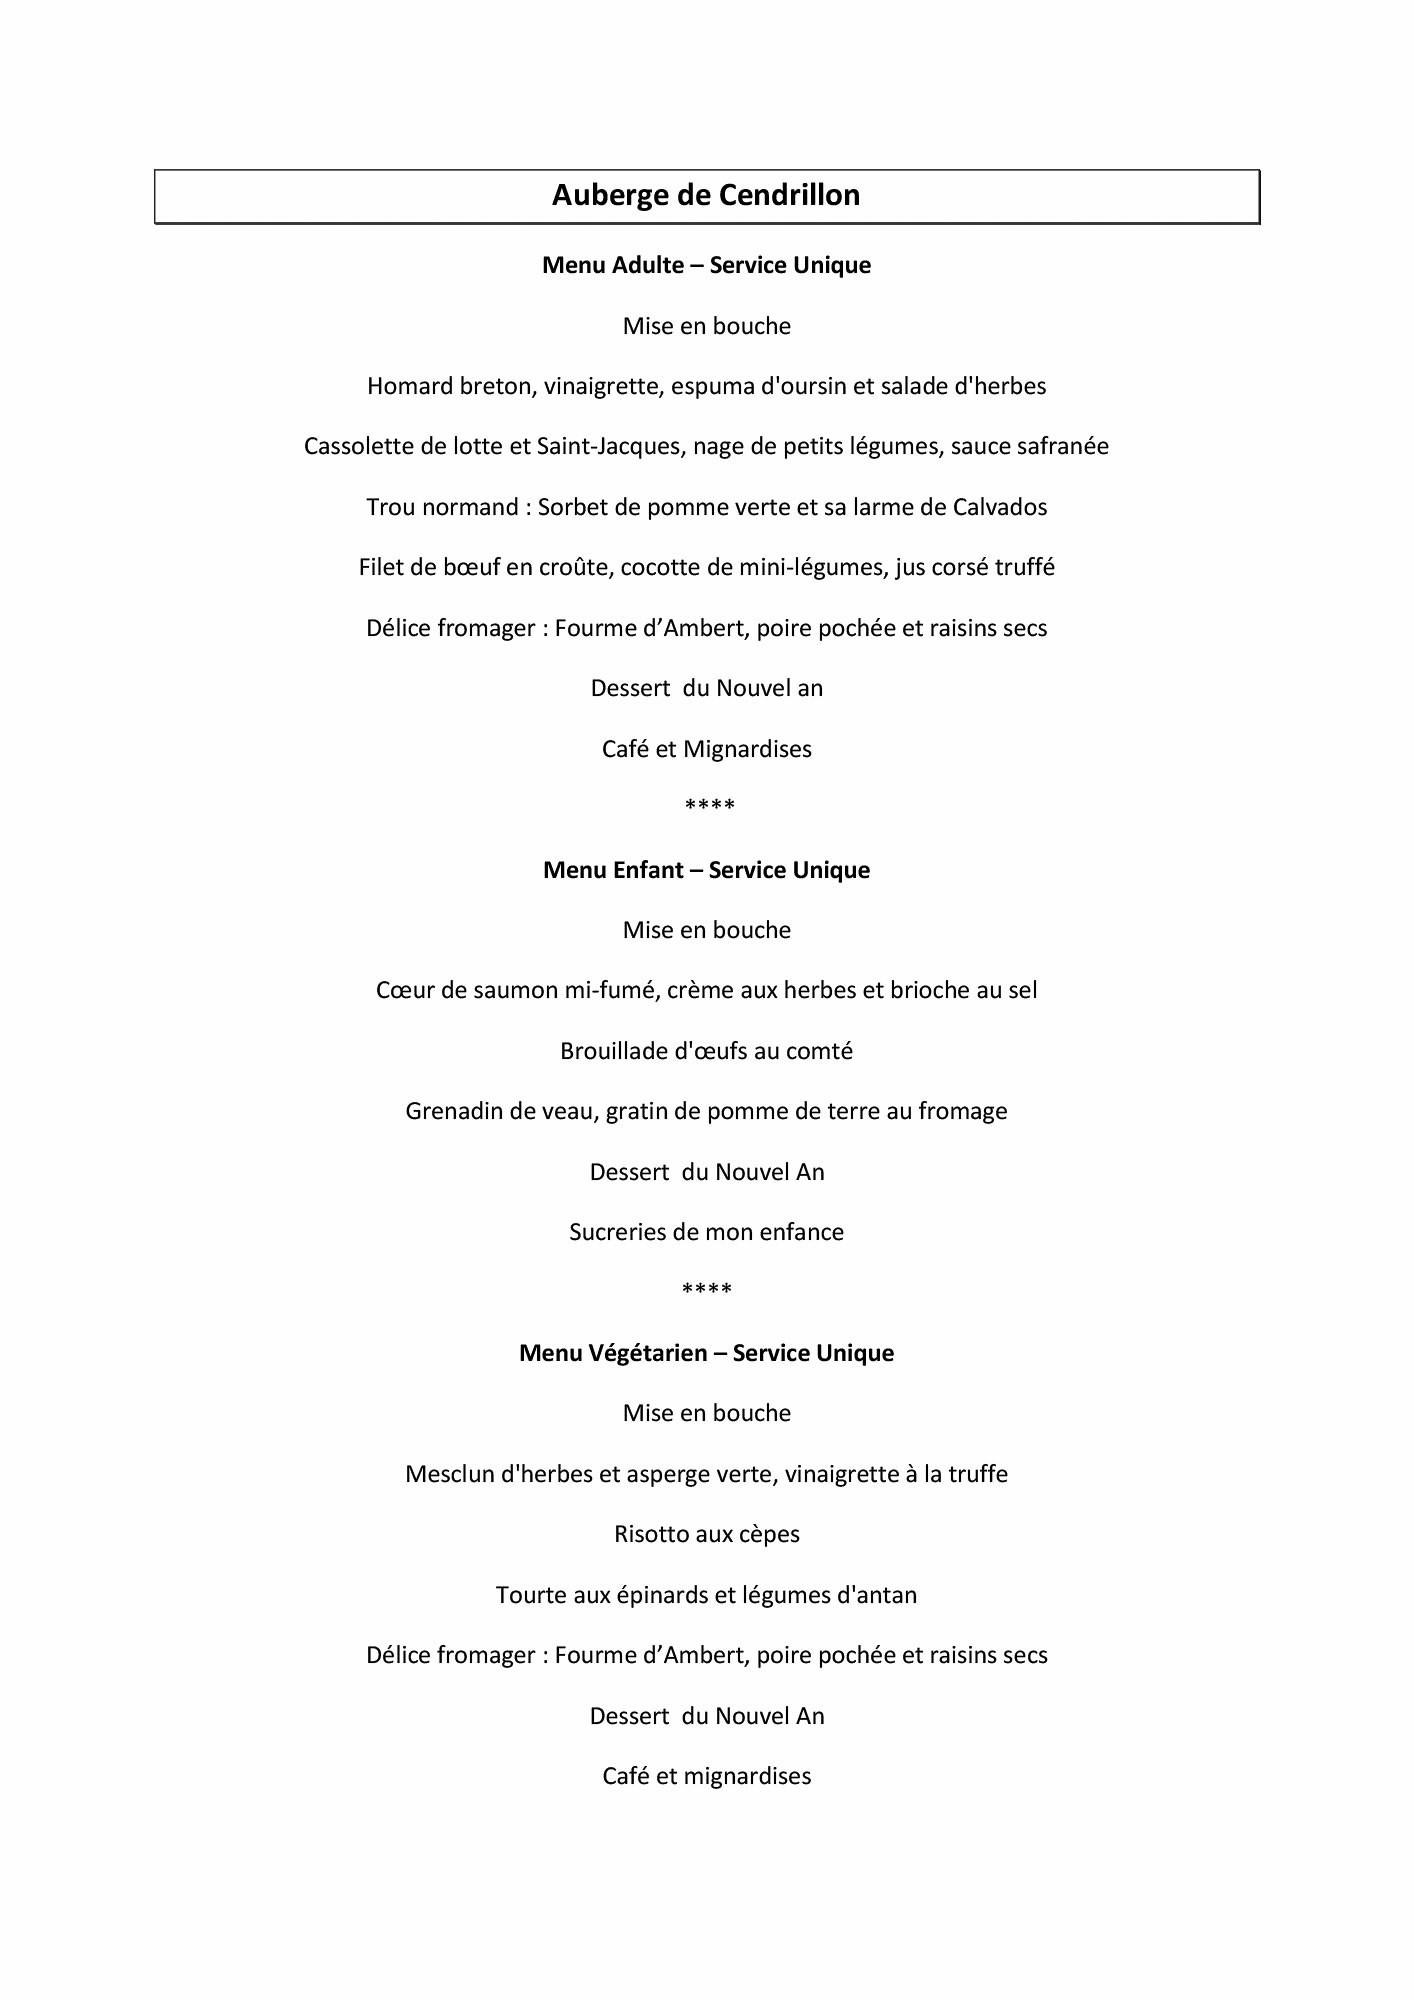 menu reveillon nouvel an 2016 disneyland paris auberge